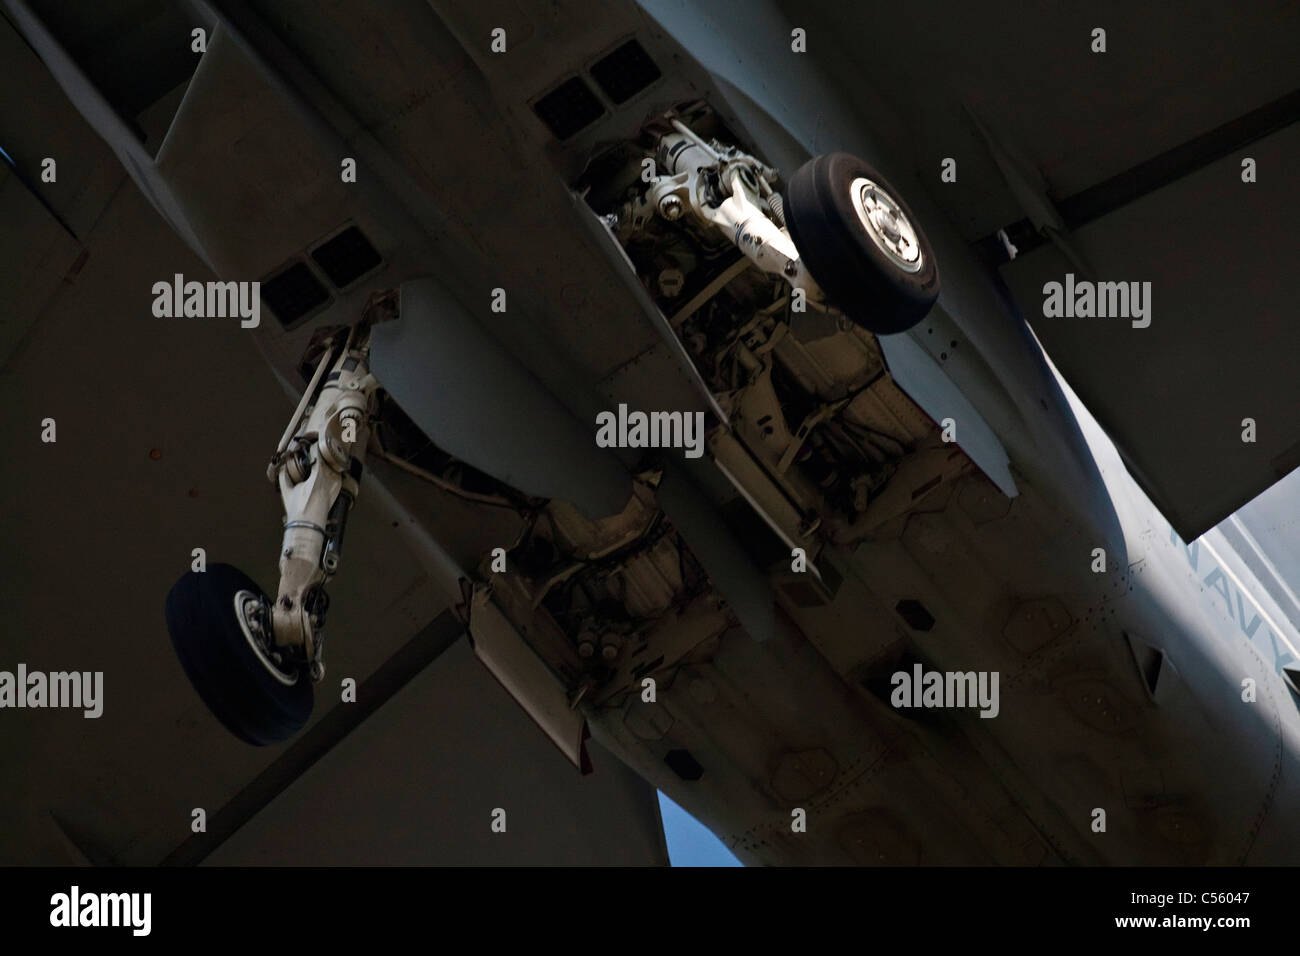 FA-18 Hornet demonstrating at an airshow, Arkansas, USA - Stock Image